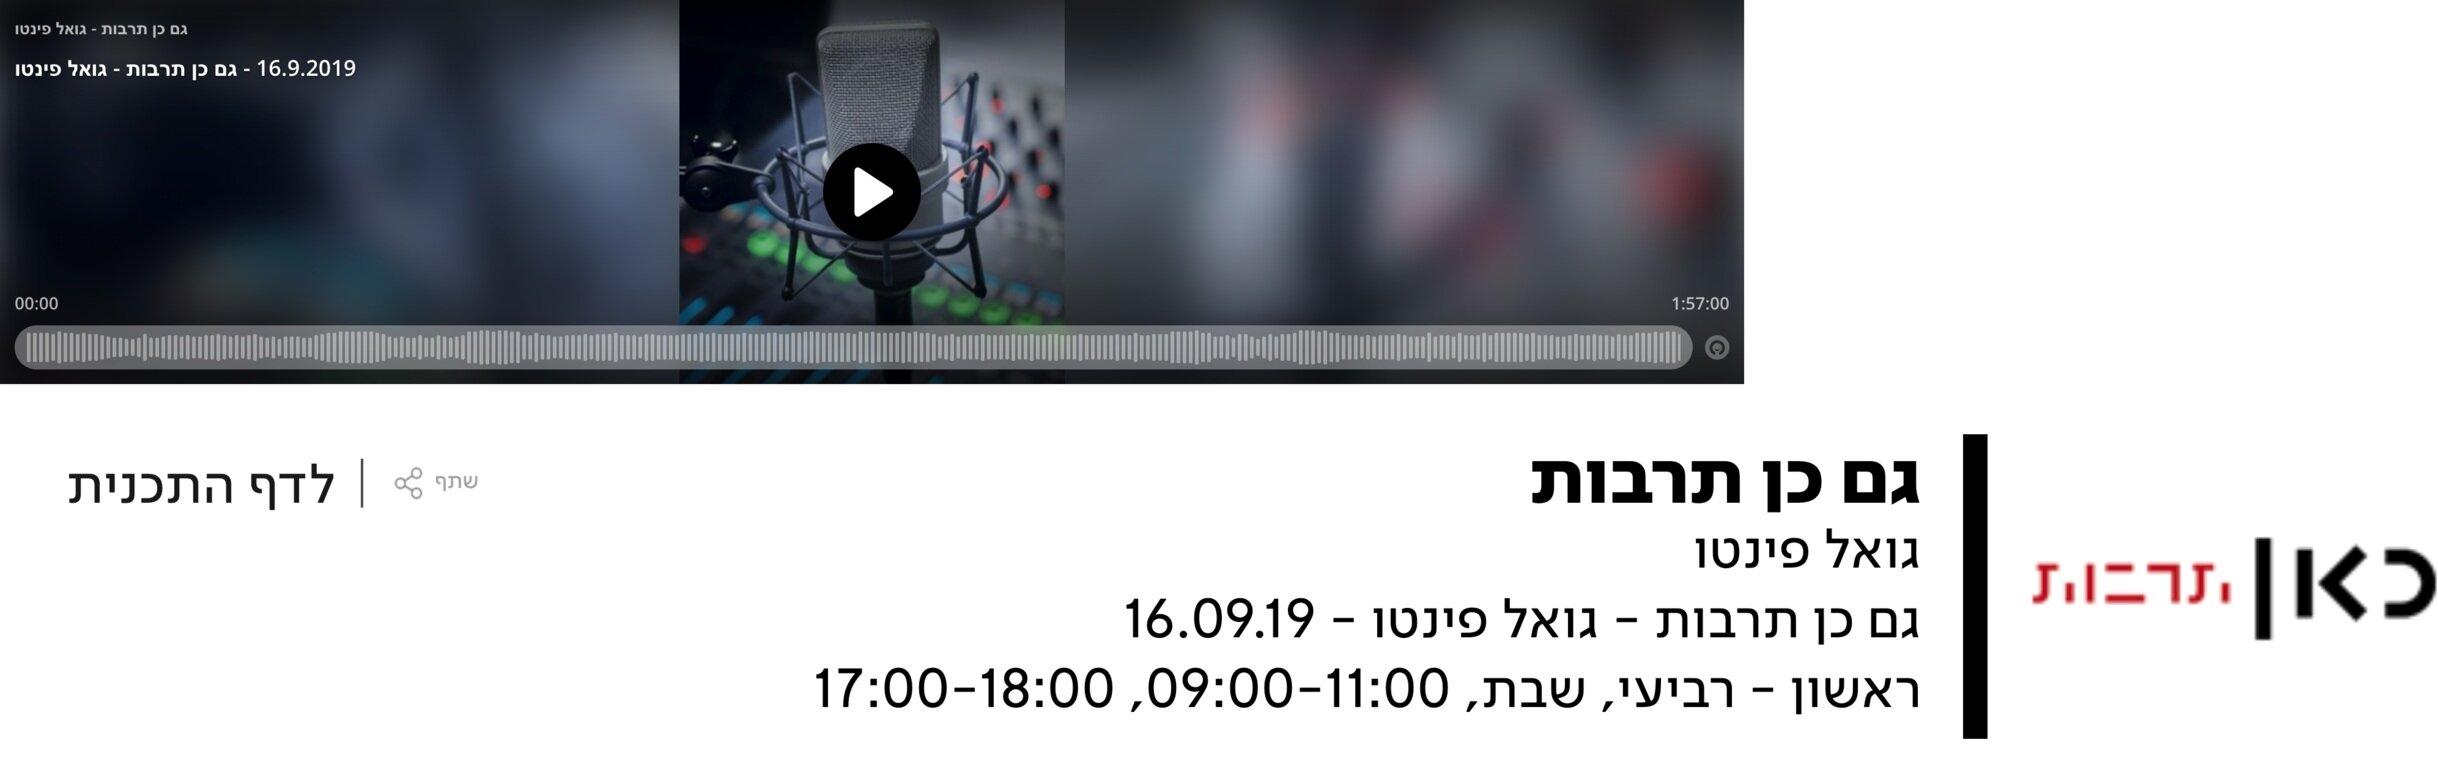 Screen+Shot+2019-09-18+at+5.20.47+PM.jpg